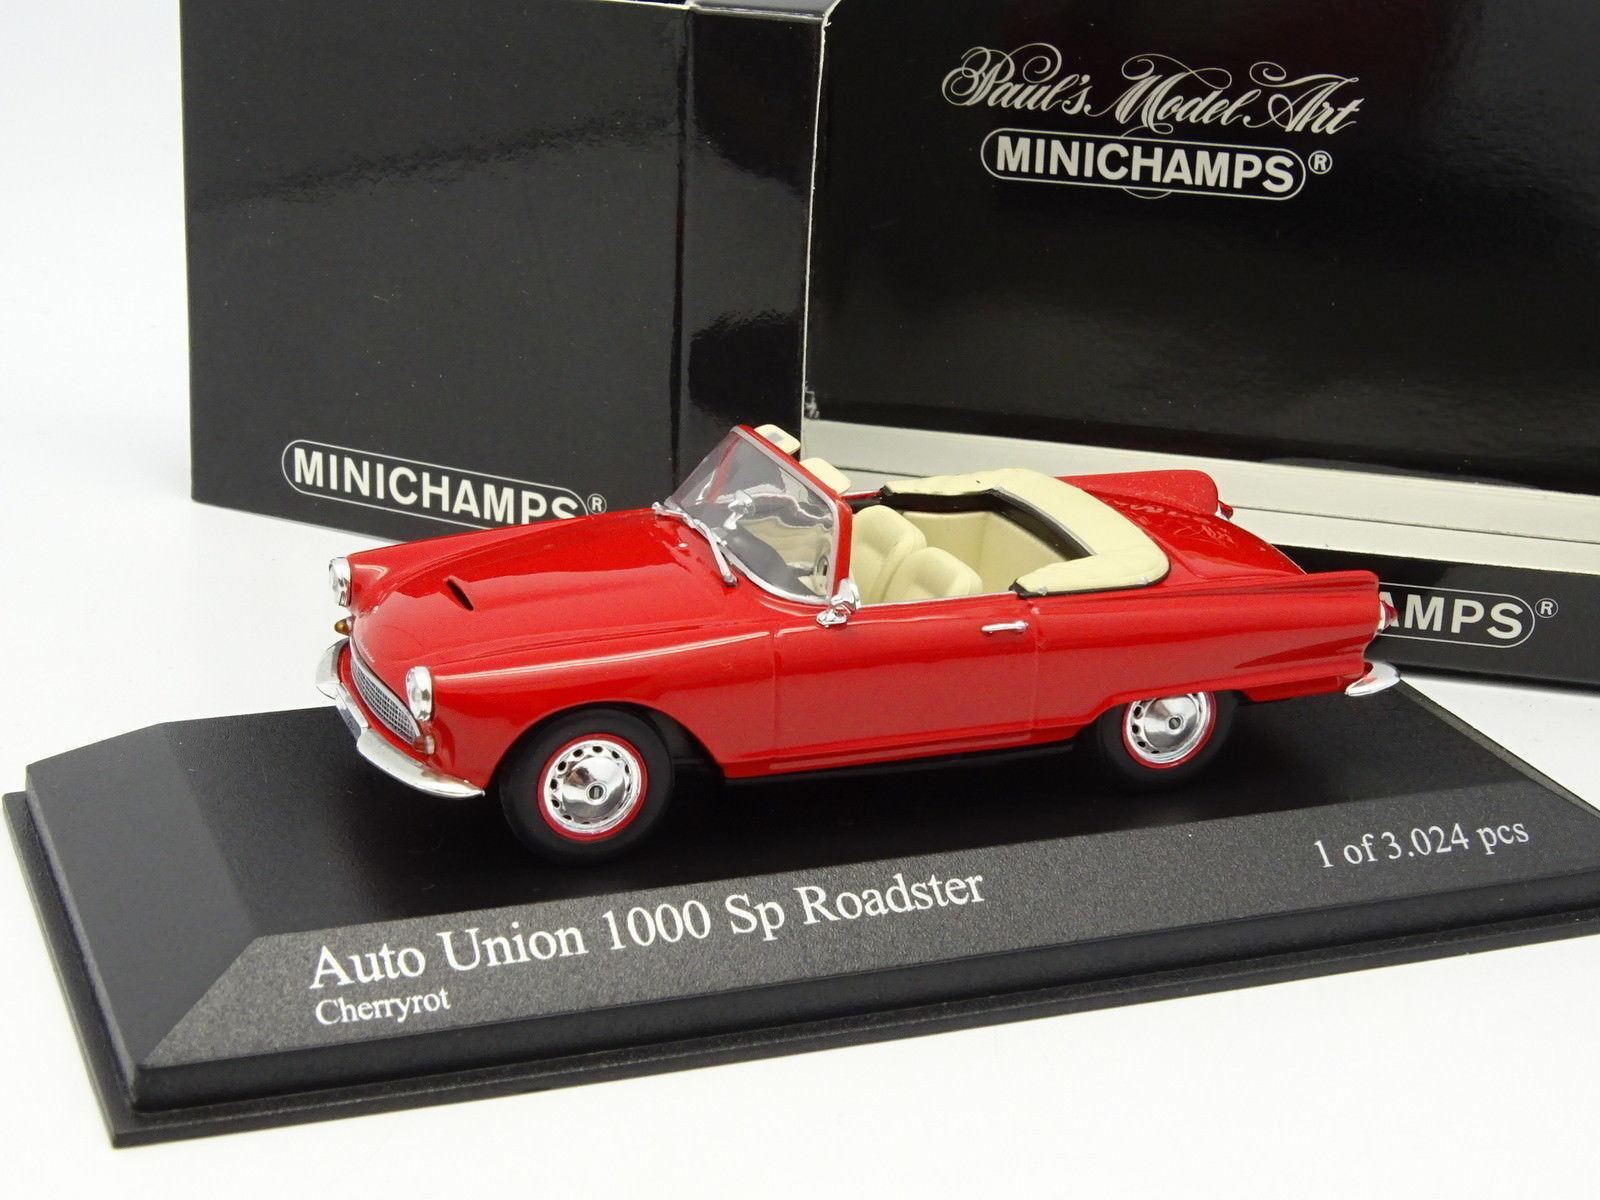 Minichamps 1 43 - Auto Union 1000 SP Roadster rosso